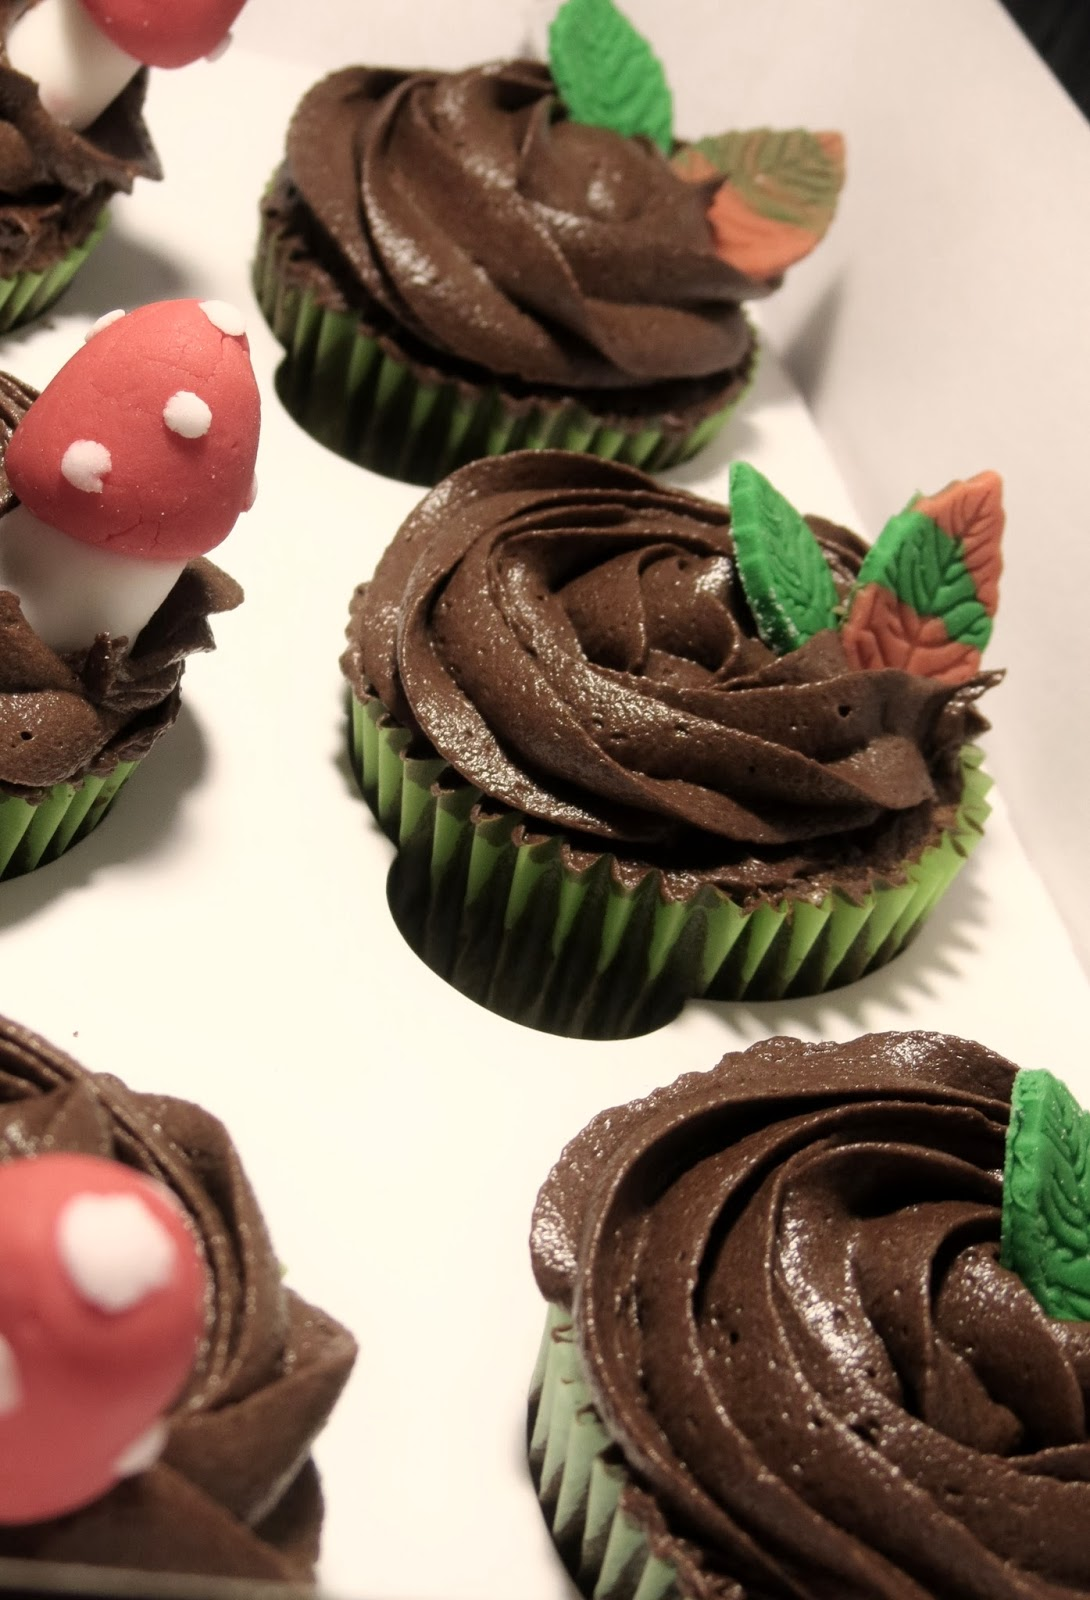 El teu cupcake, cupcake Lleida, cupcakes de xocolata